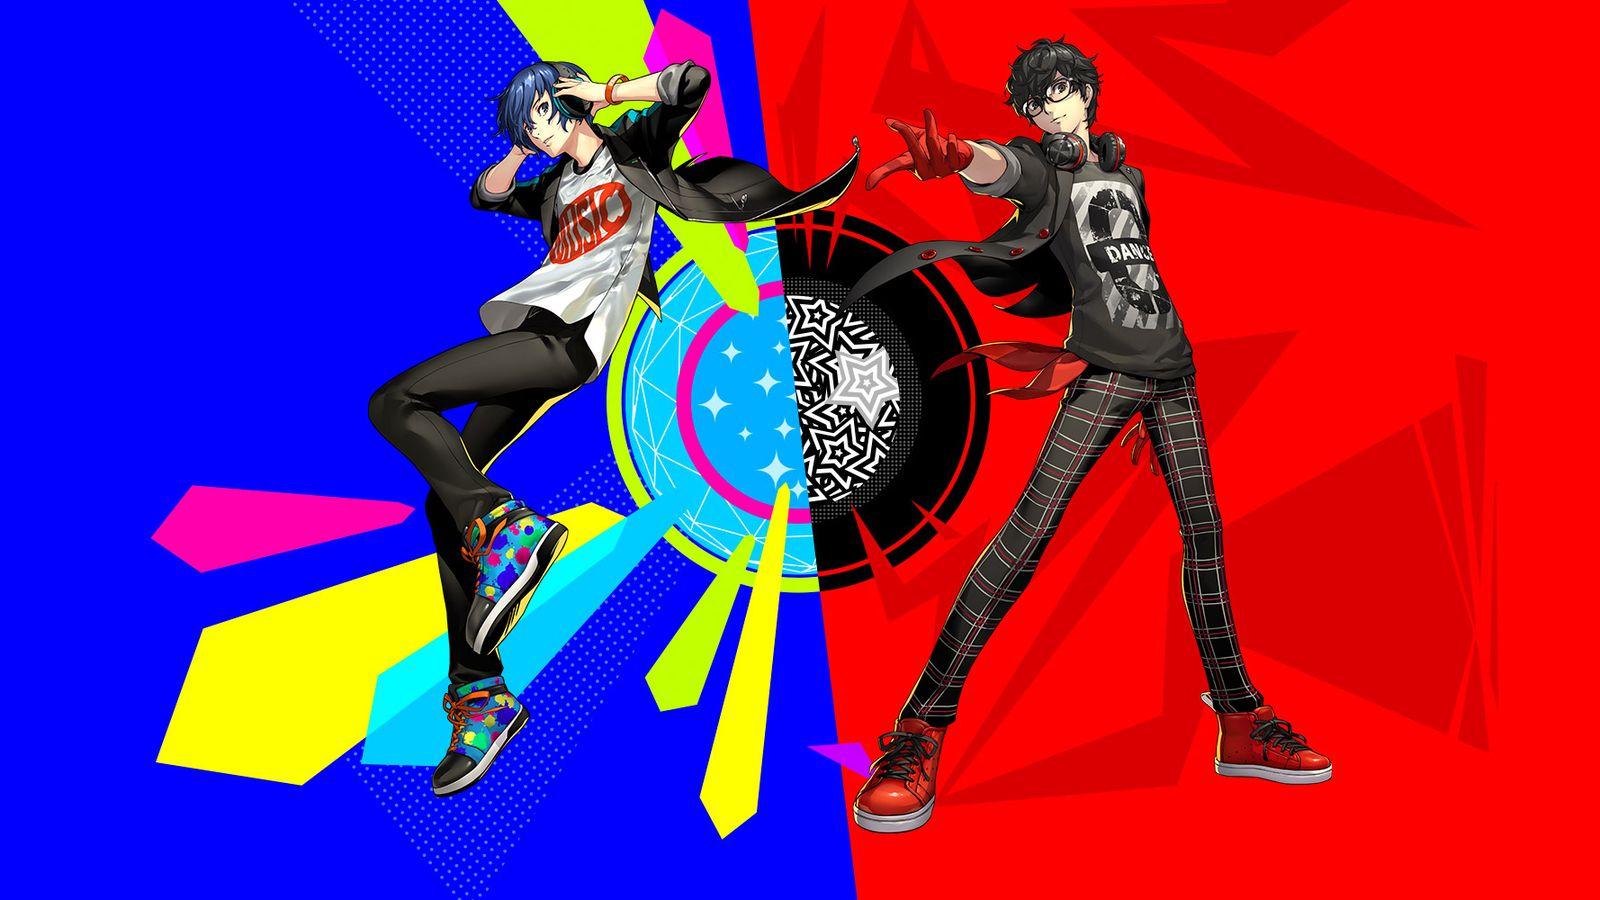 Persona 5 dancing star night last surprise Part 7 10